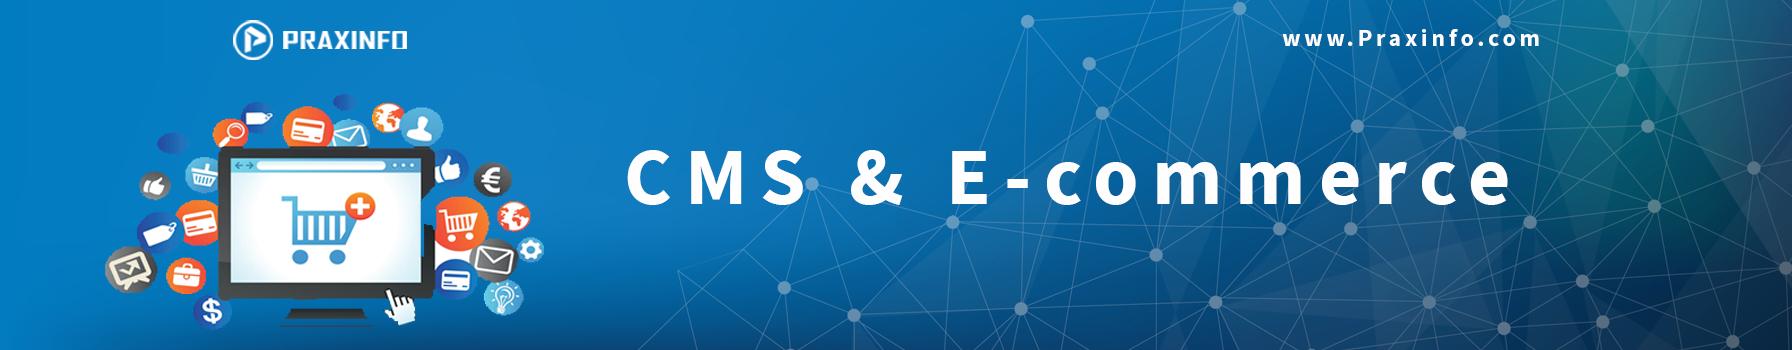 CMS-E-commerce.png